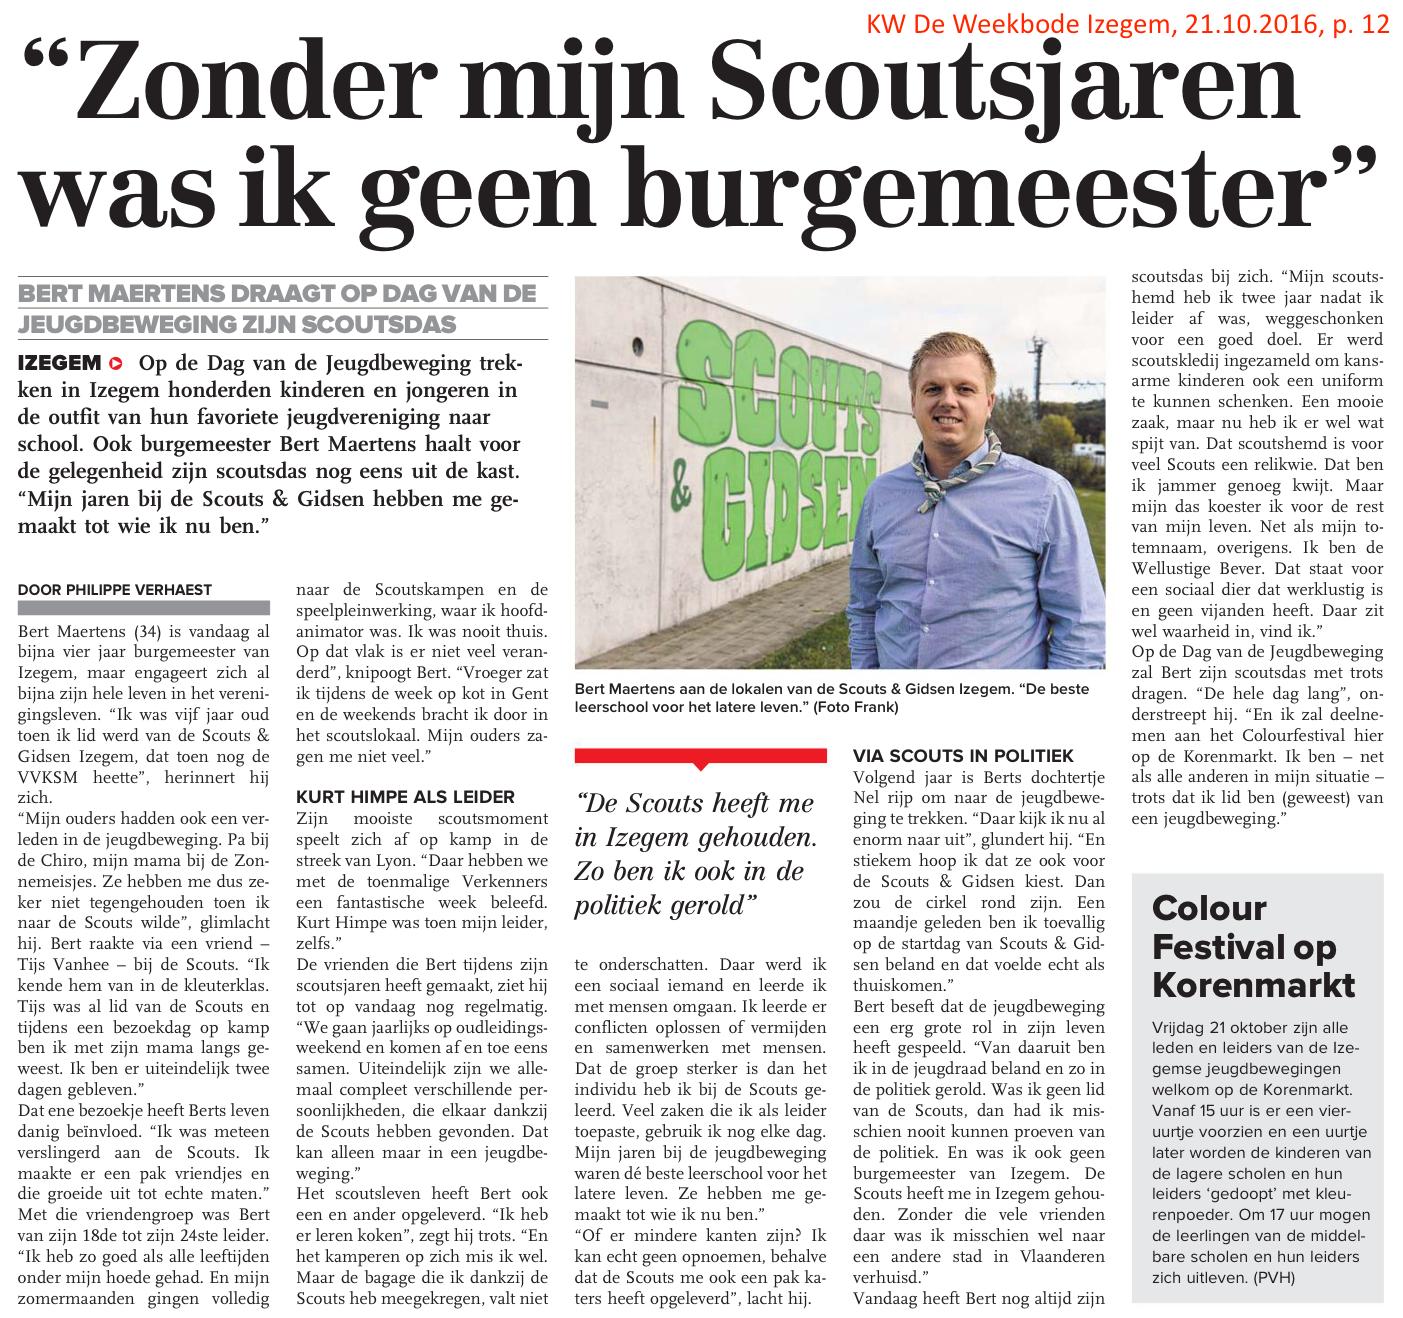 KW De Weekbode Izegem, 21.10.2016, p. 12